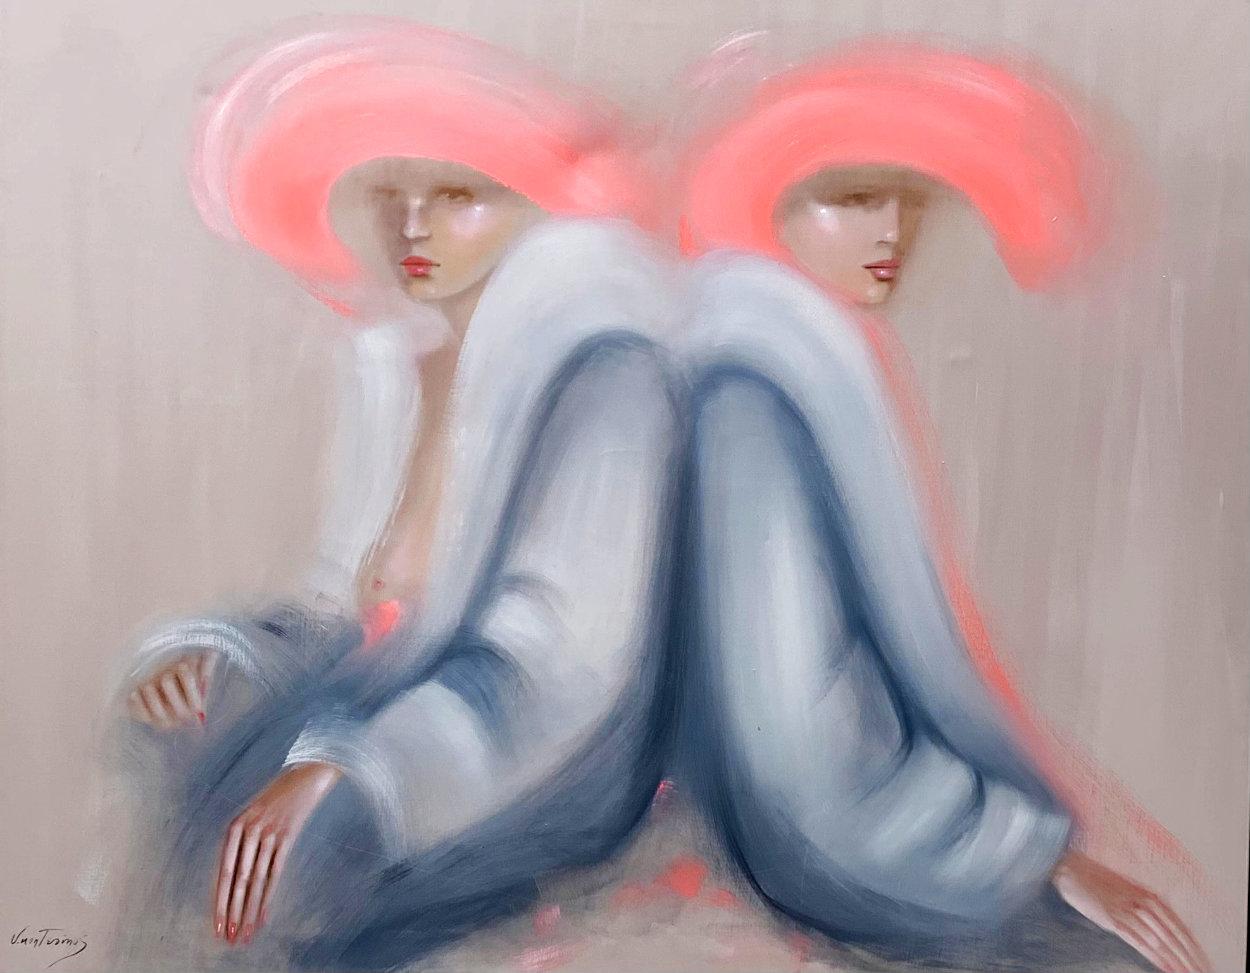 Friends 1982 53x63 Super Huge Original Painting by Victoria Montesinos